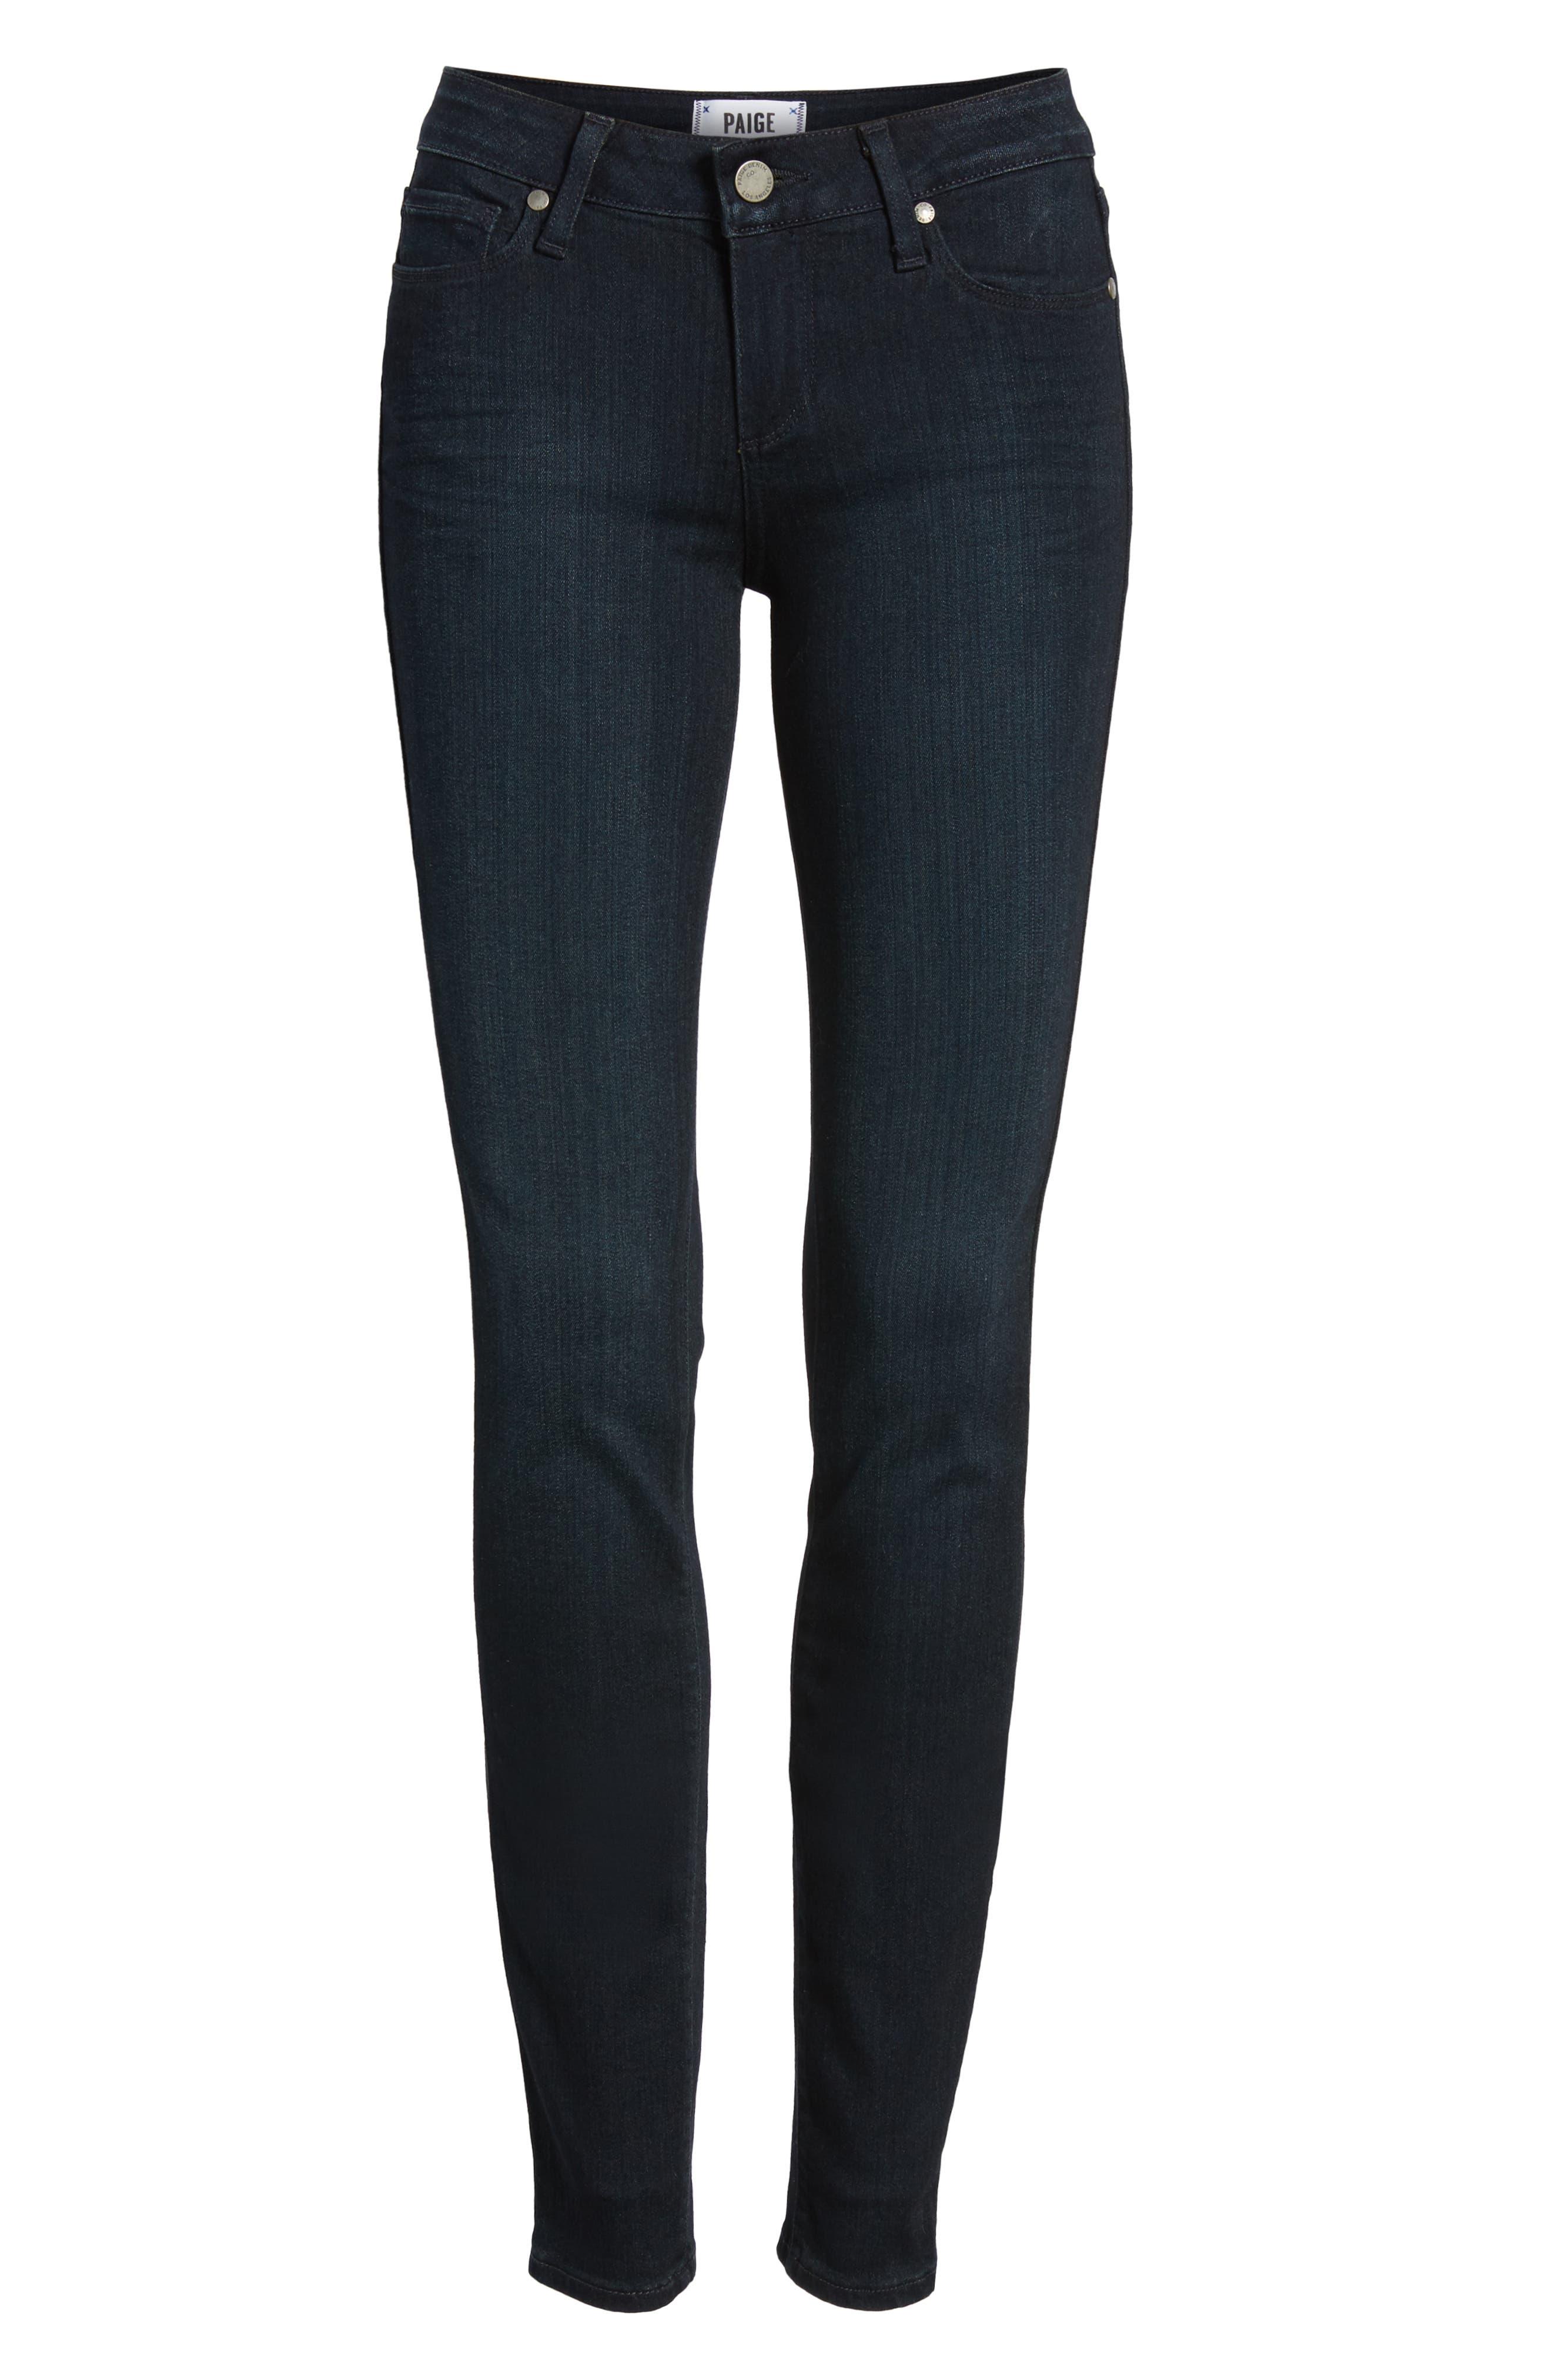 Transcend - Verdugo Ultra Skinny Jeans,                             Alternate thumbnail 3, color,                             TONAL MONA